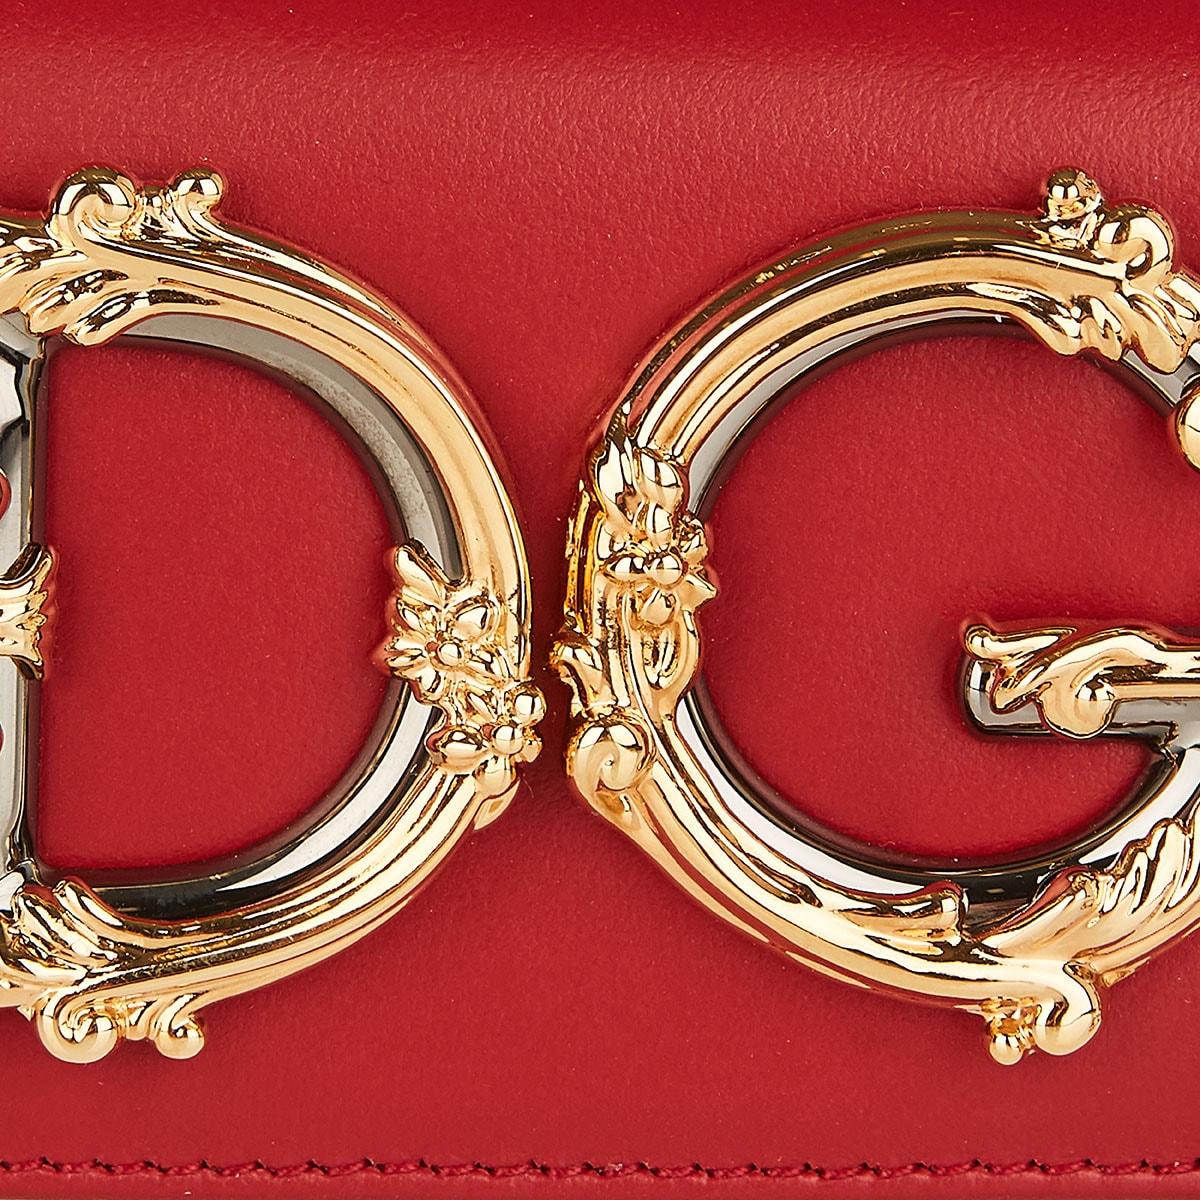 DG Girls mini leather chain bag